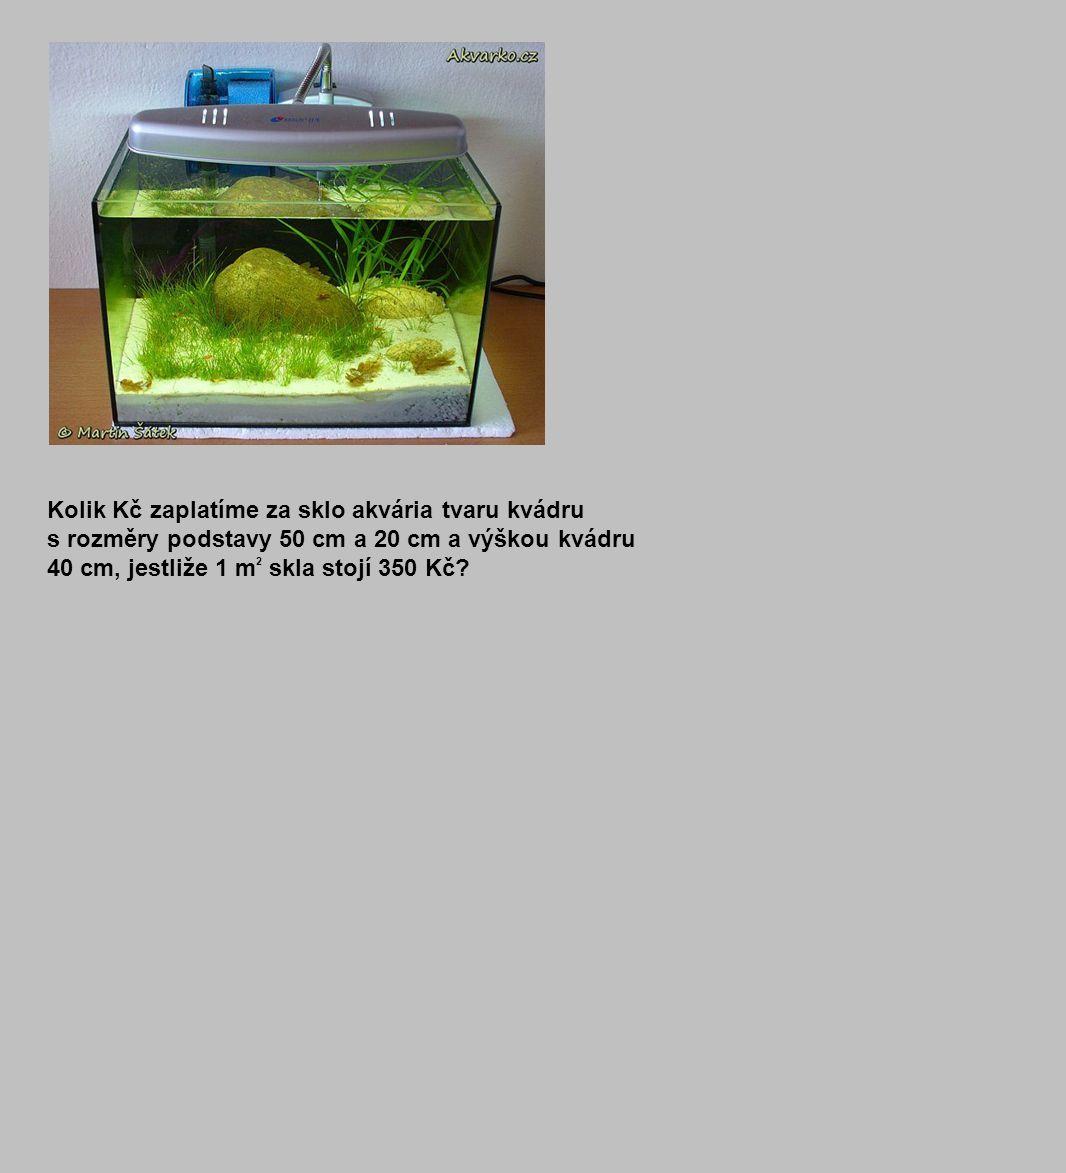 Kolik Kč zaplatíme za sklo akvária tvaru kvádru